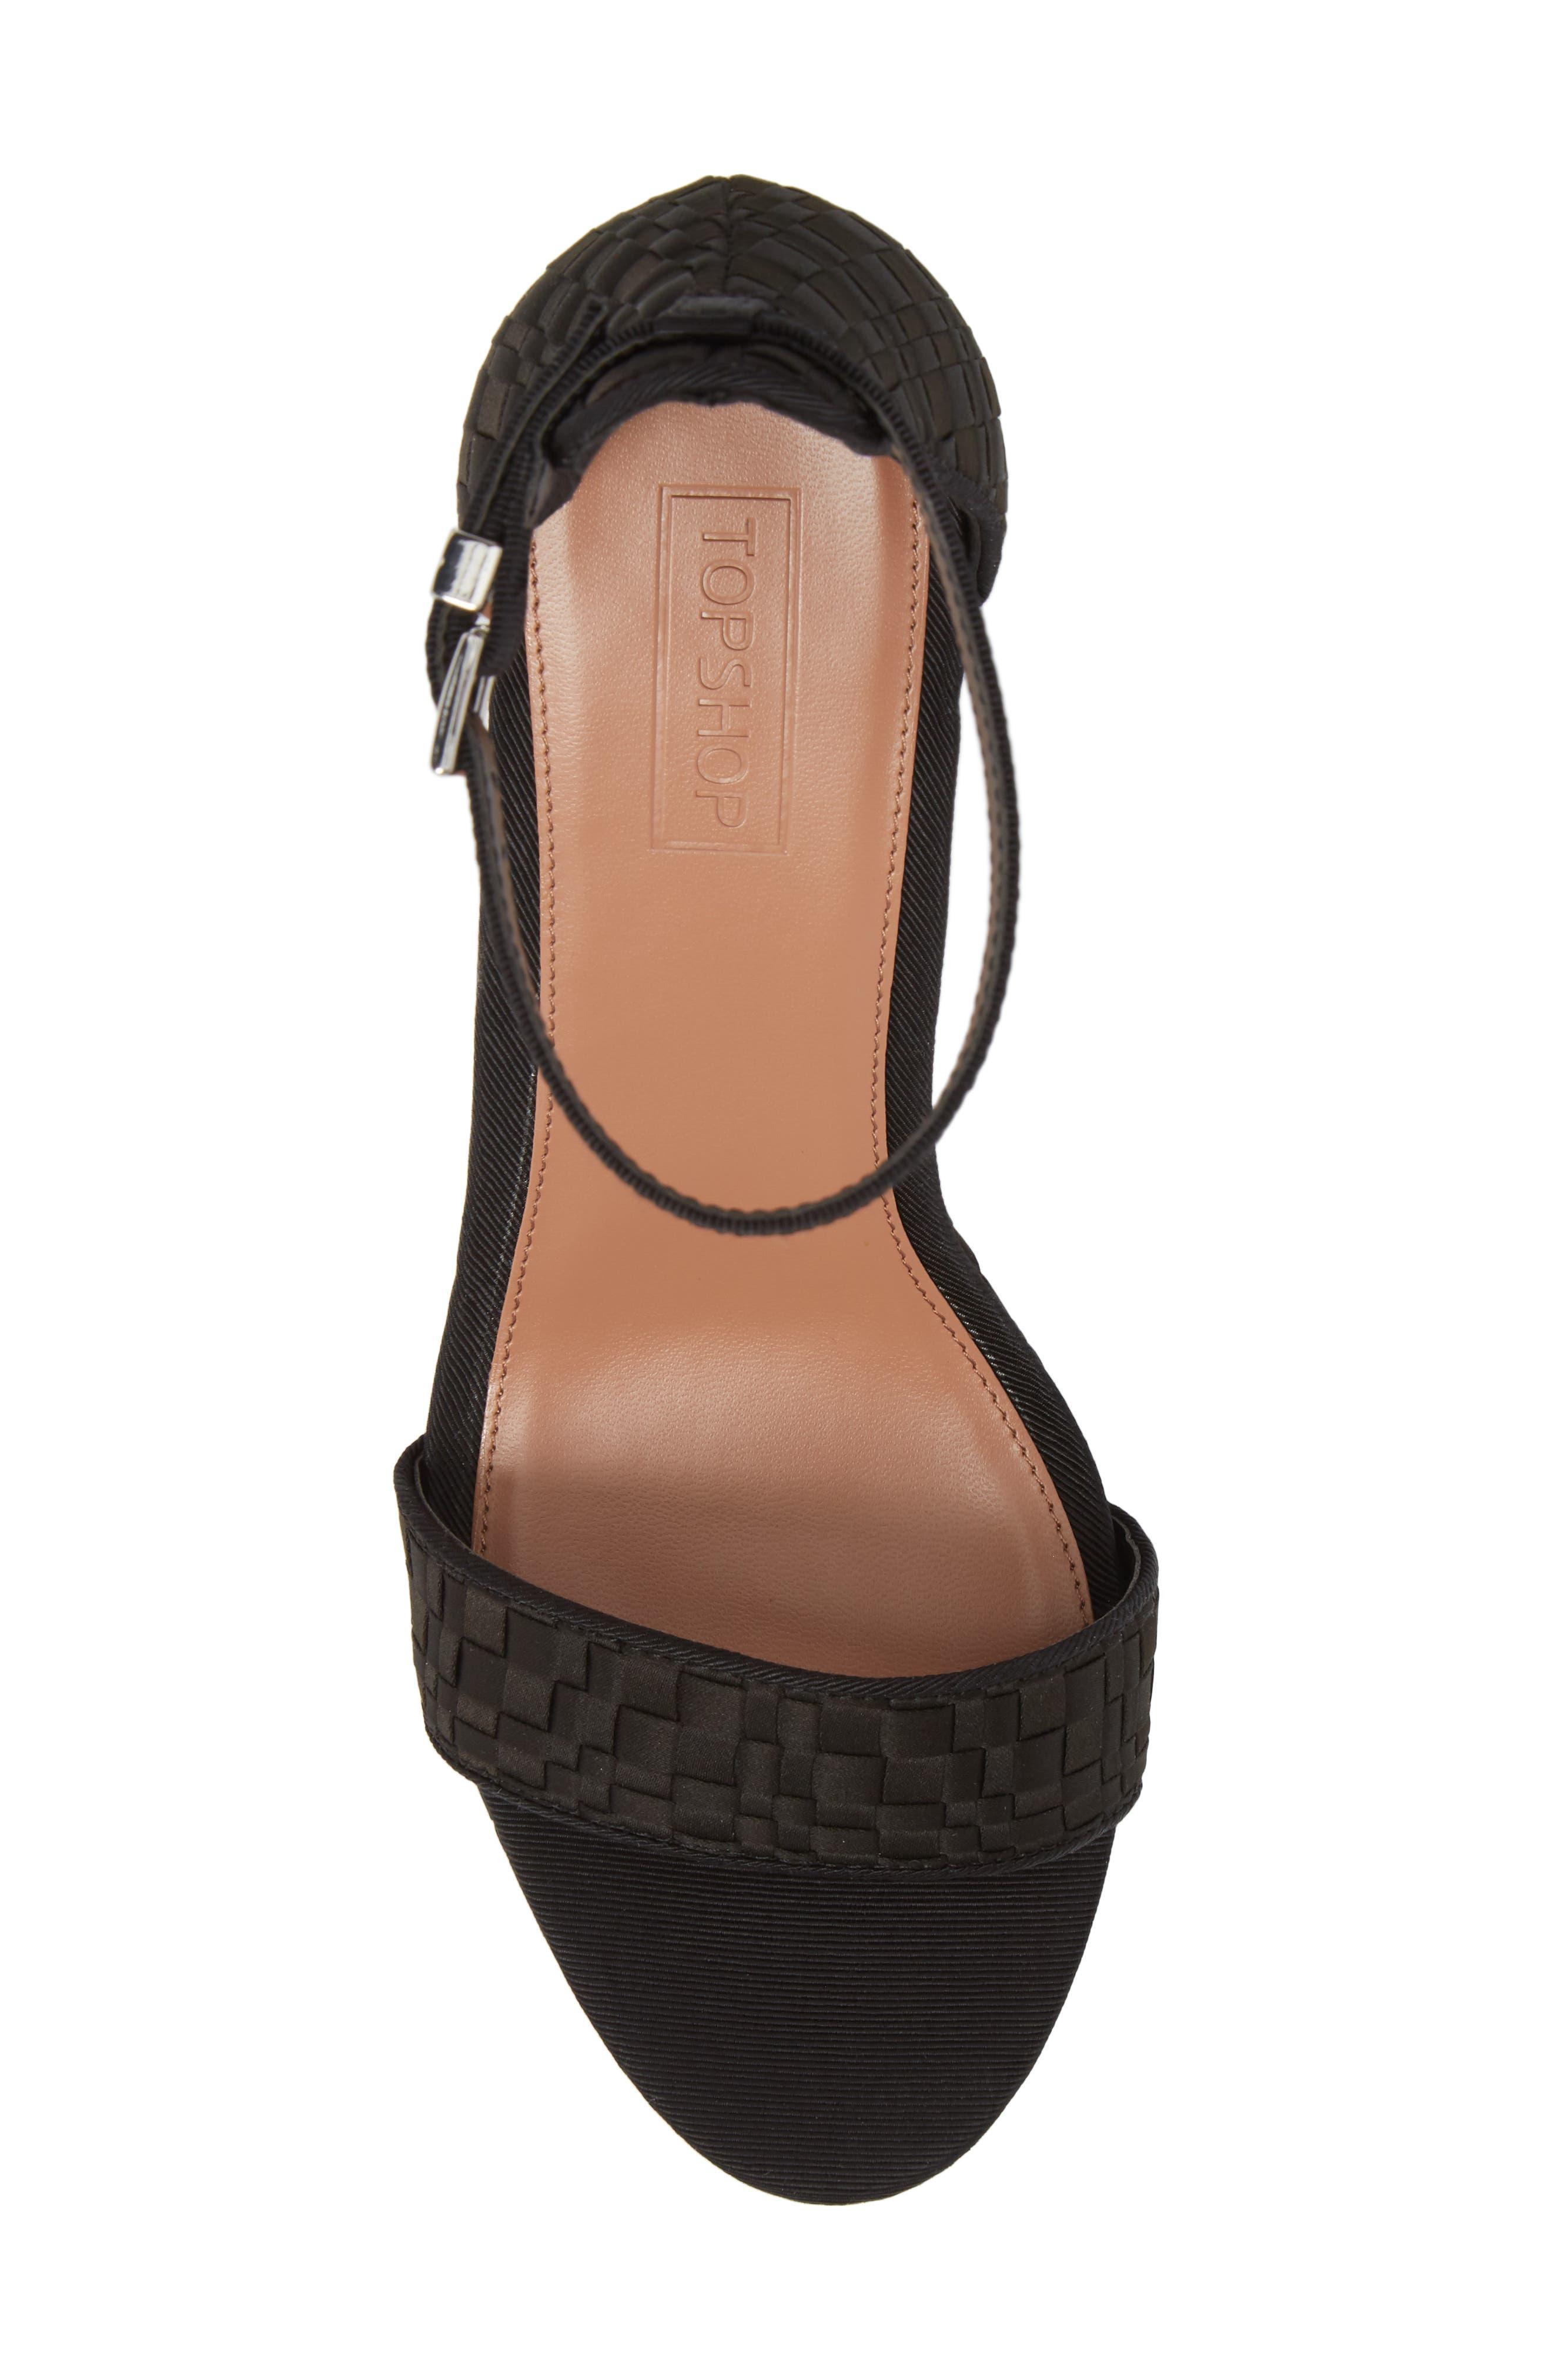 Sloane Woven Platform Sandal,                             Alternate thumbnail 5, color,                             Black